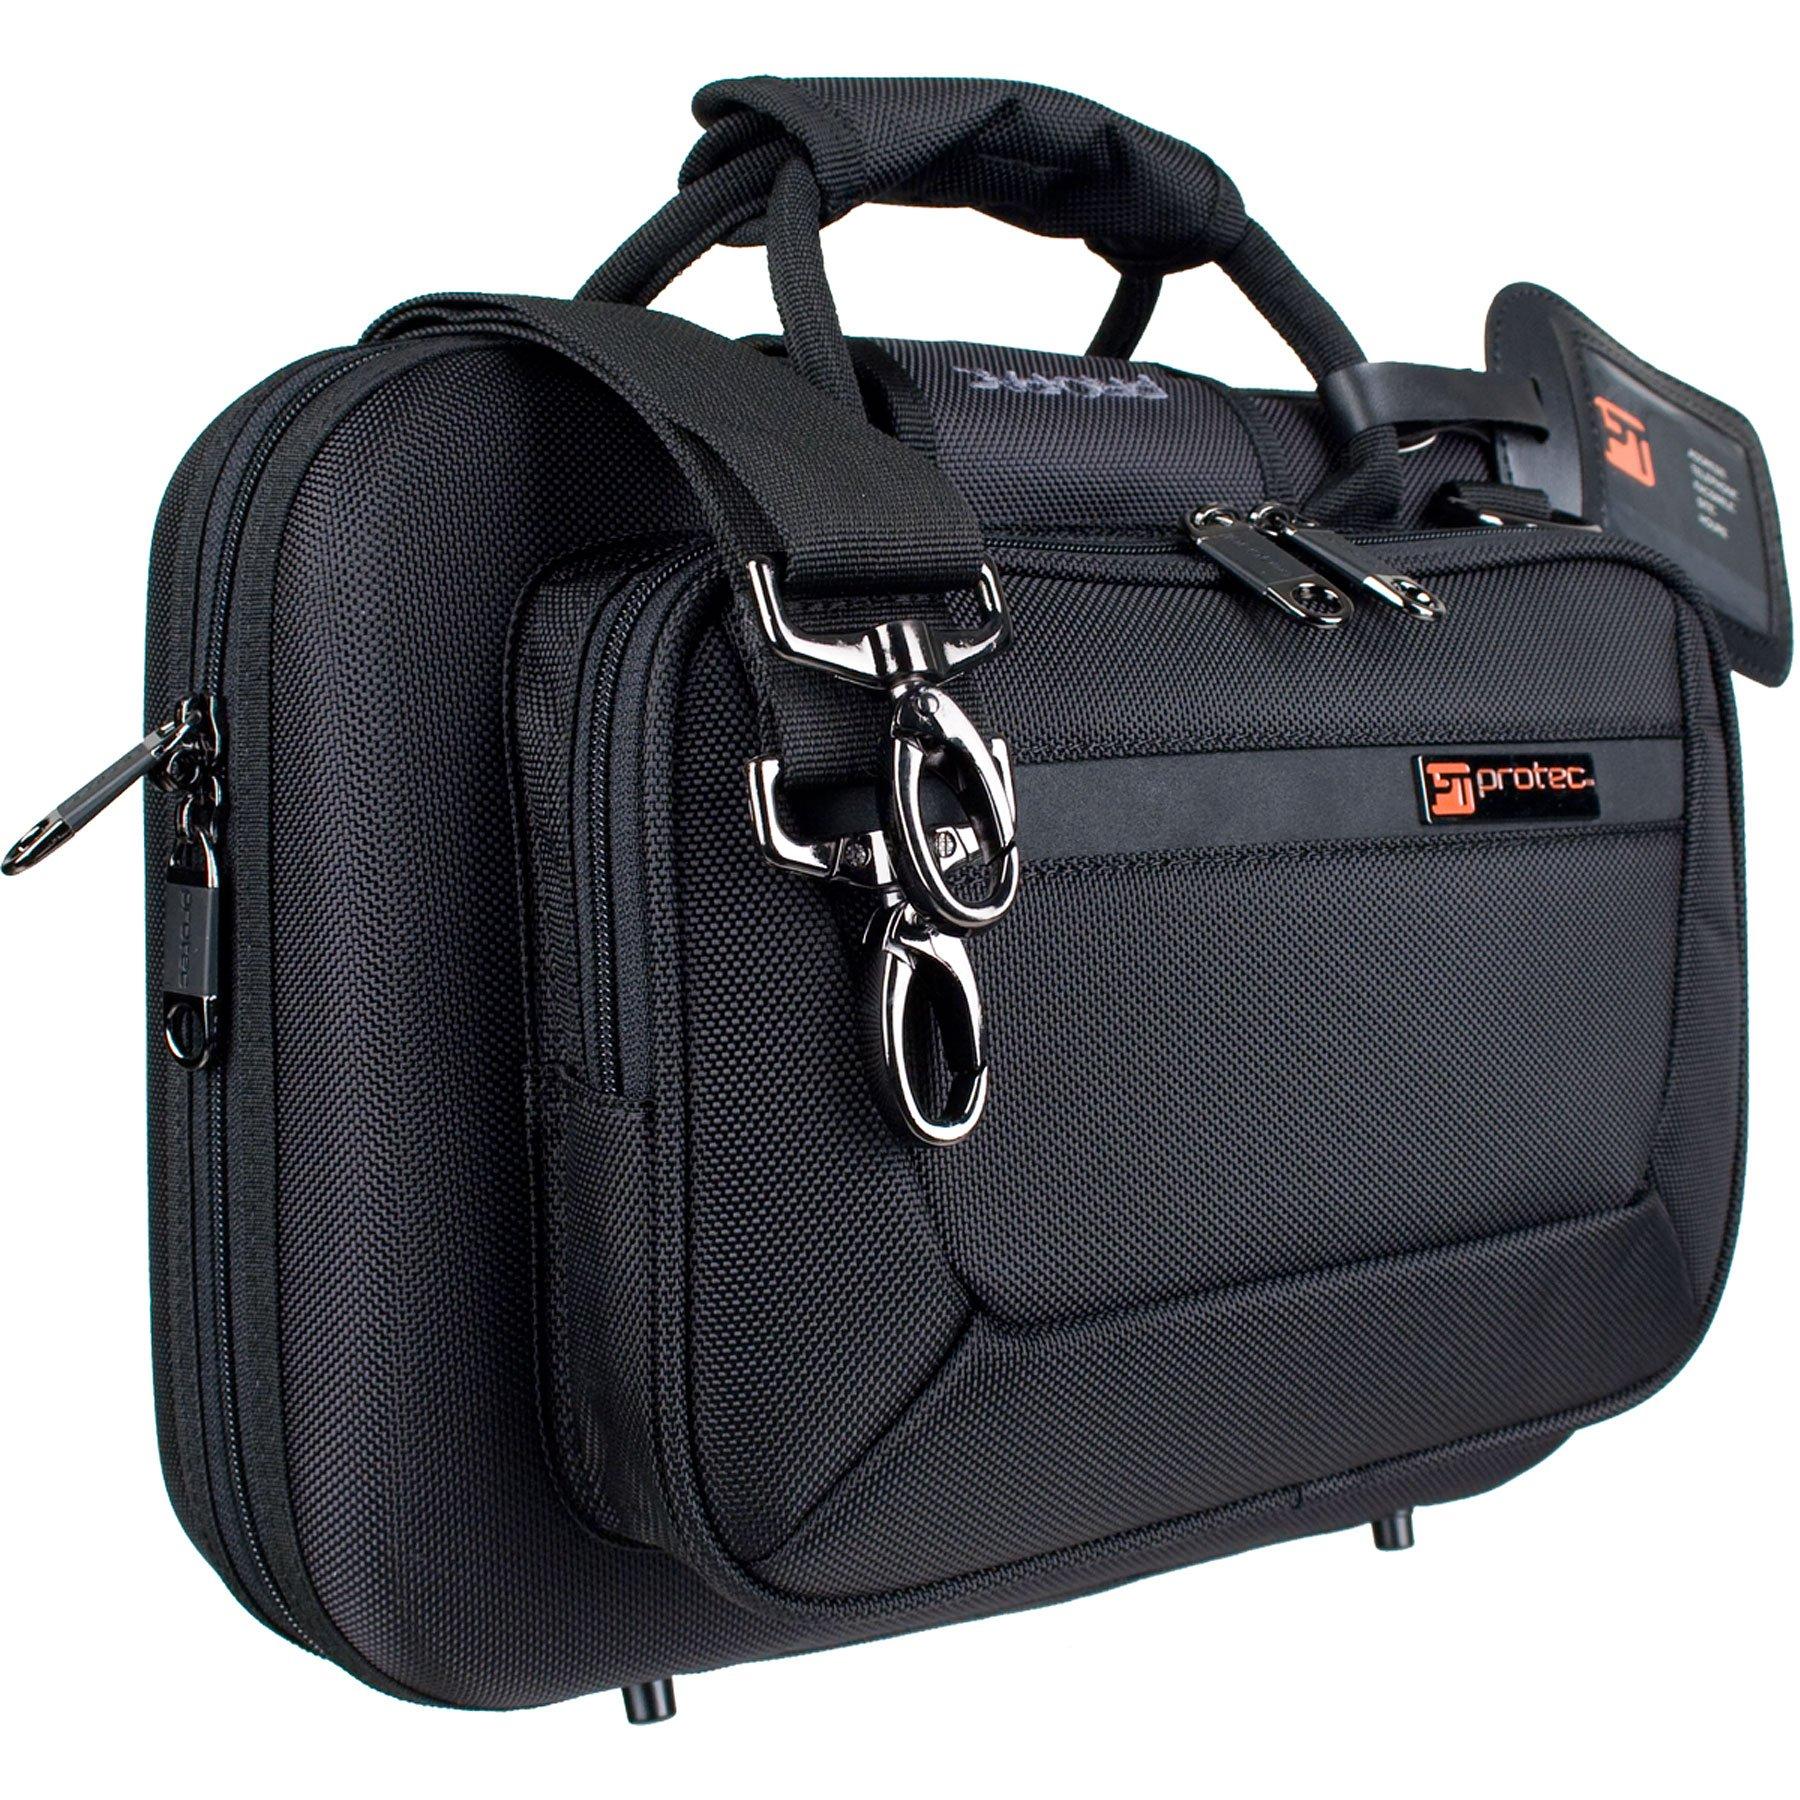 Protec Bb Clarinet Slimline PRO PAC Case, Black, Model PB307 by ProTec